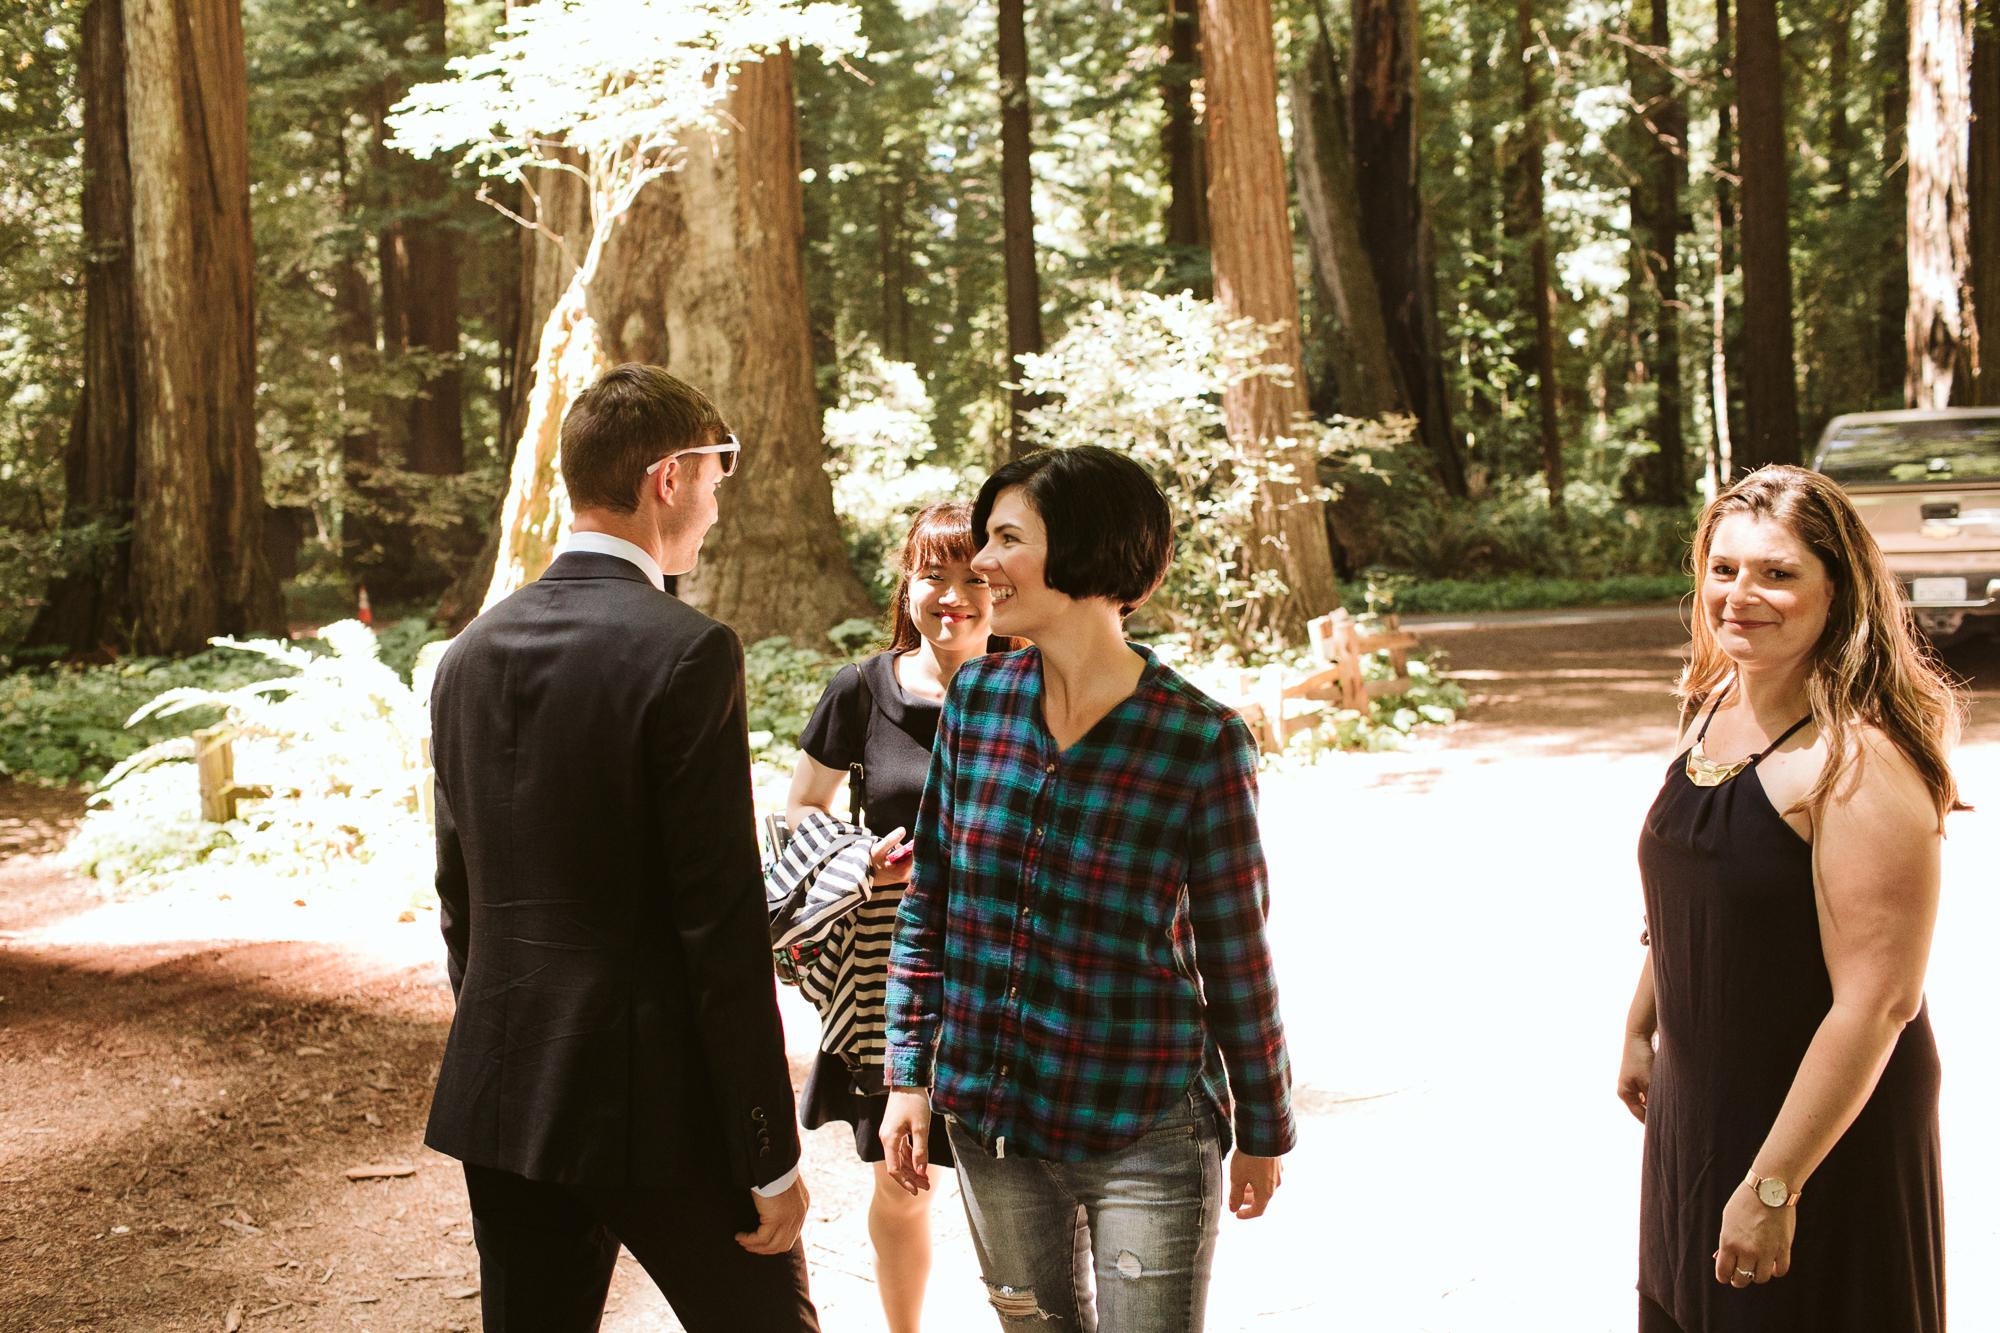 California-wedding-photographer-alfonso-flores-pamplin-groove-350.jpg